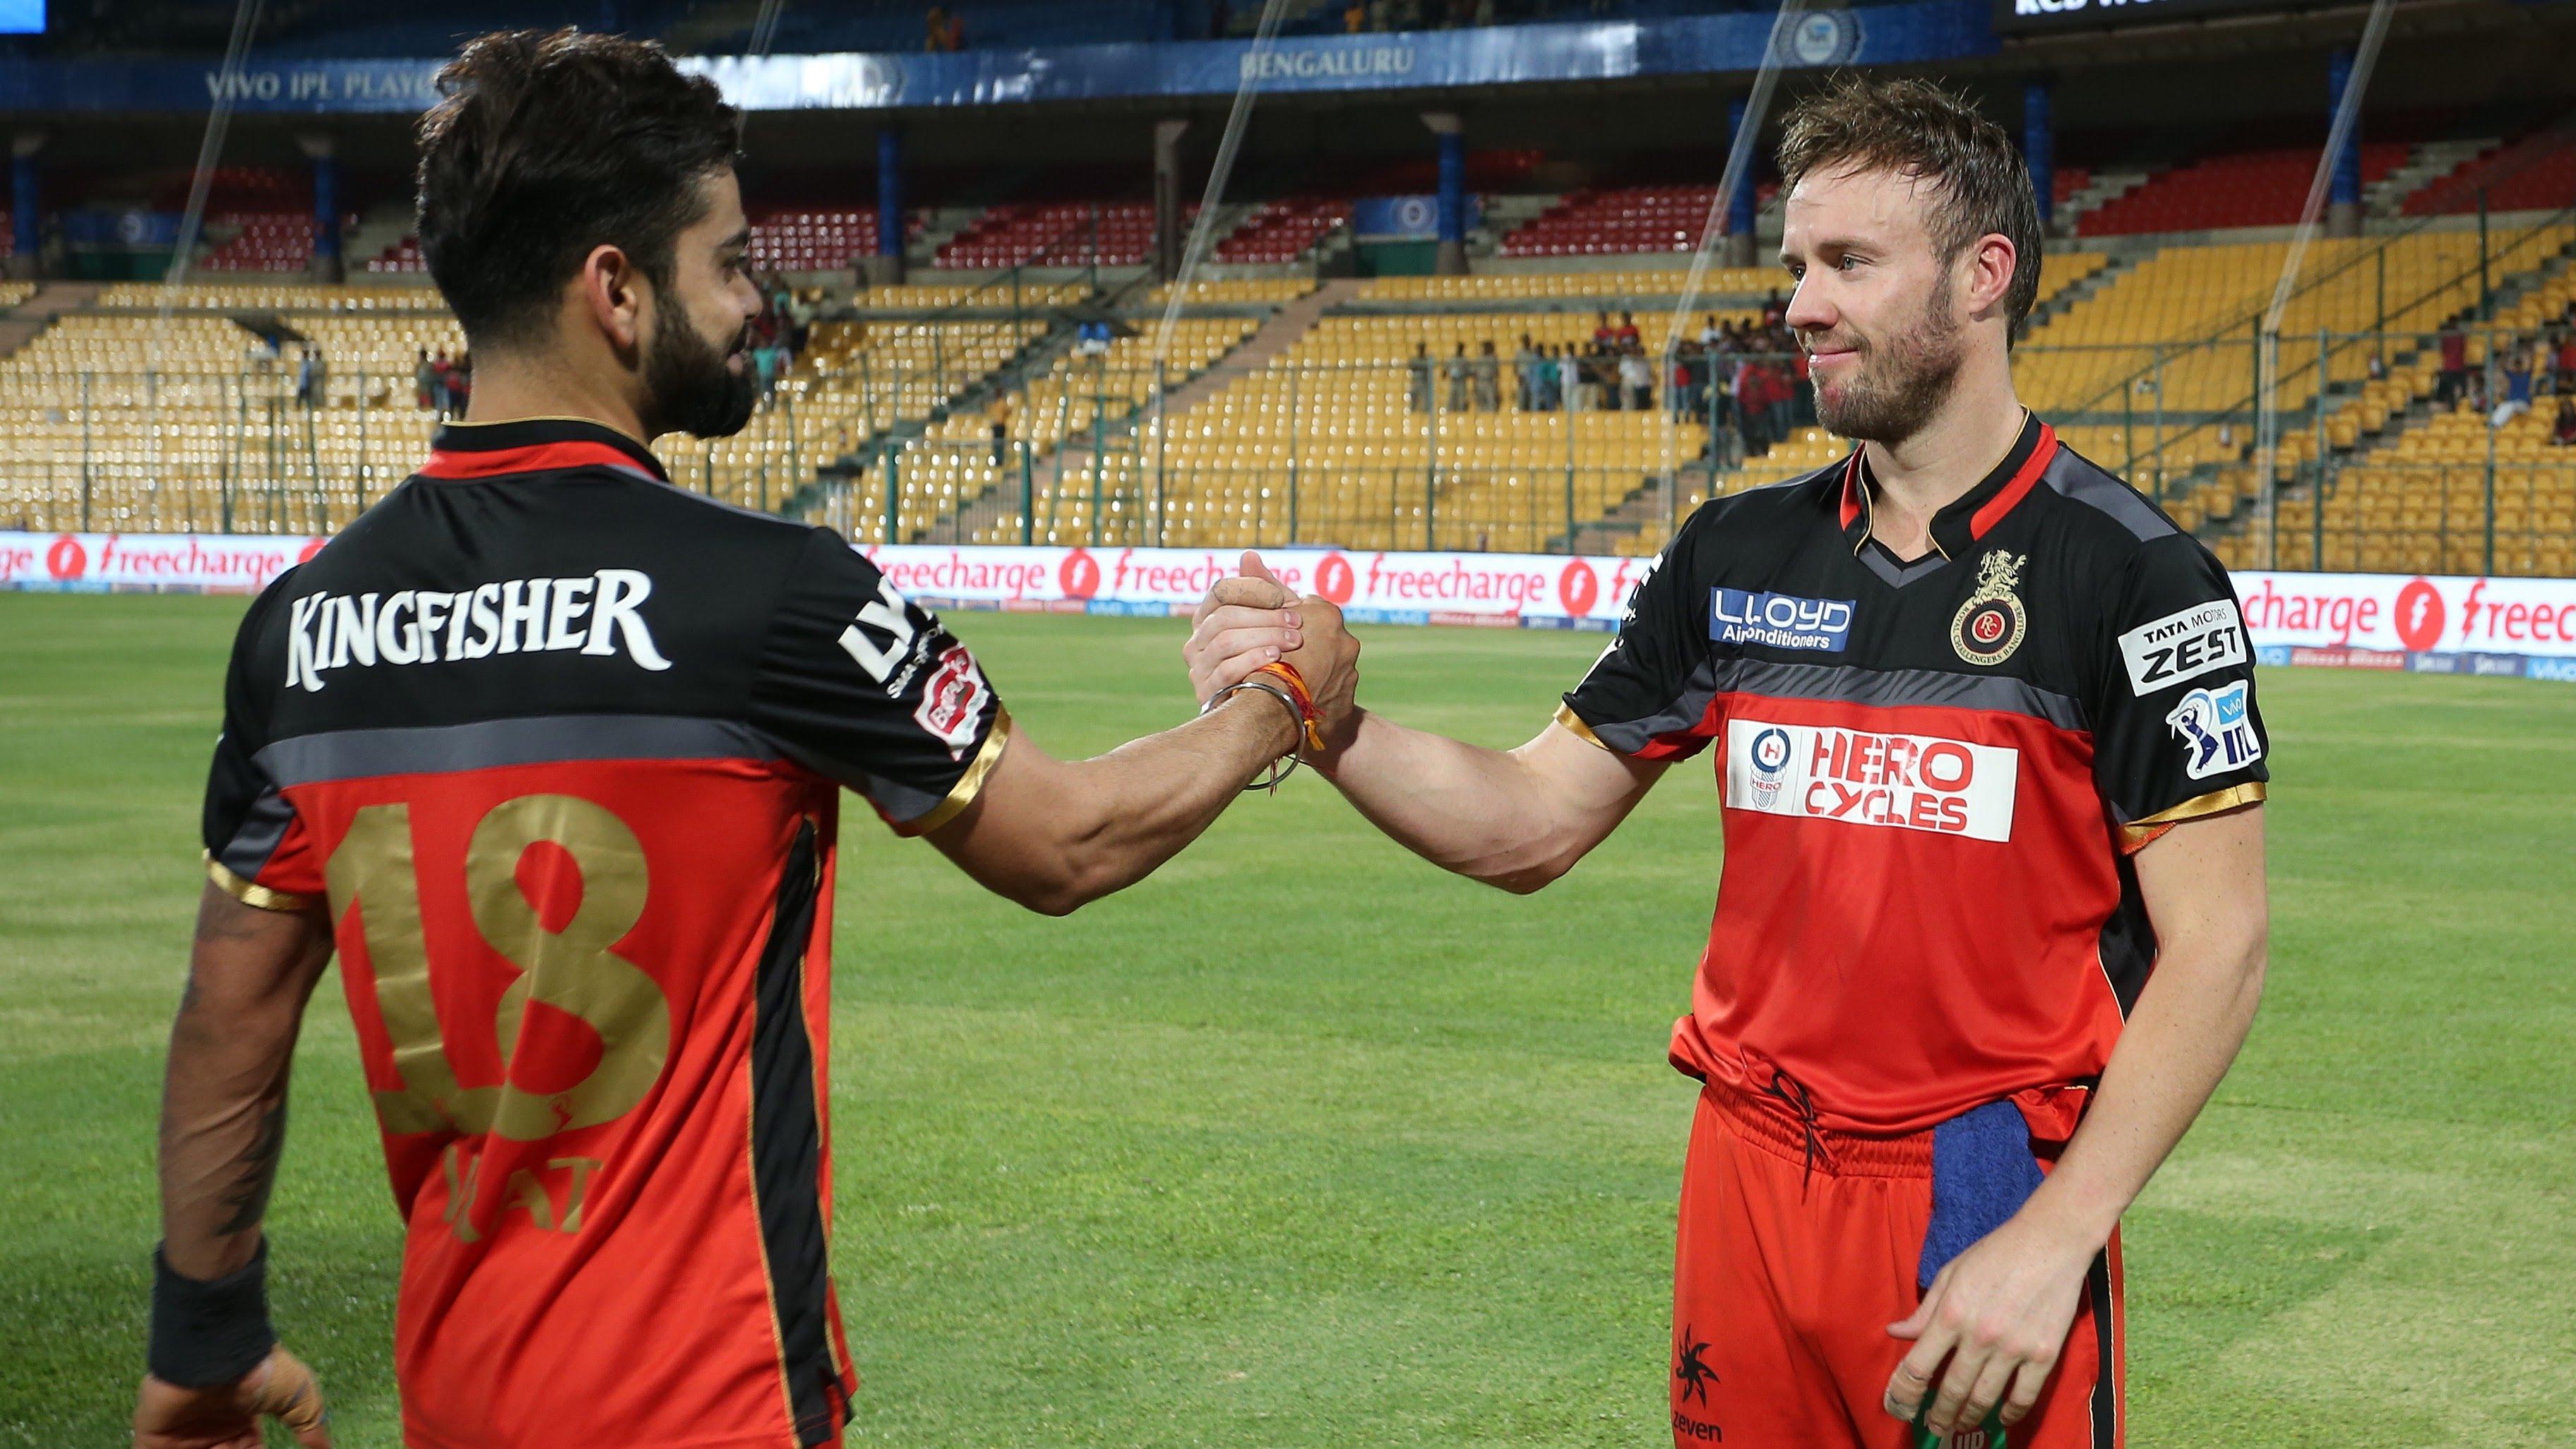 IPL 2018: AB de Villiers hails Virat Kohli as the best player in the world